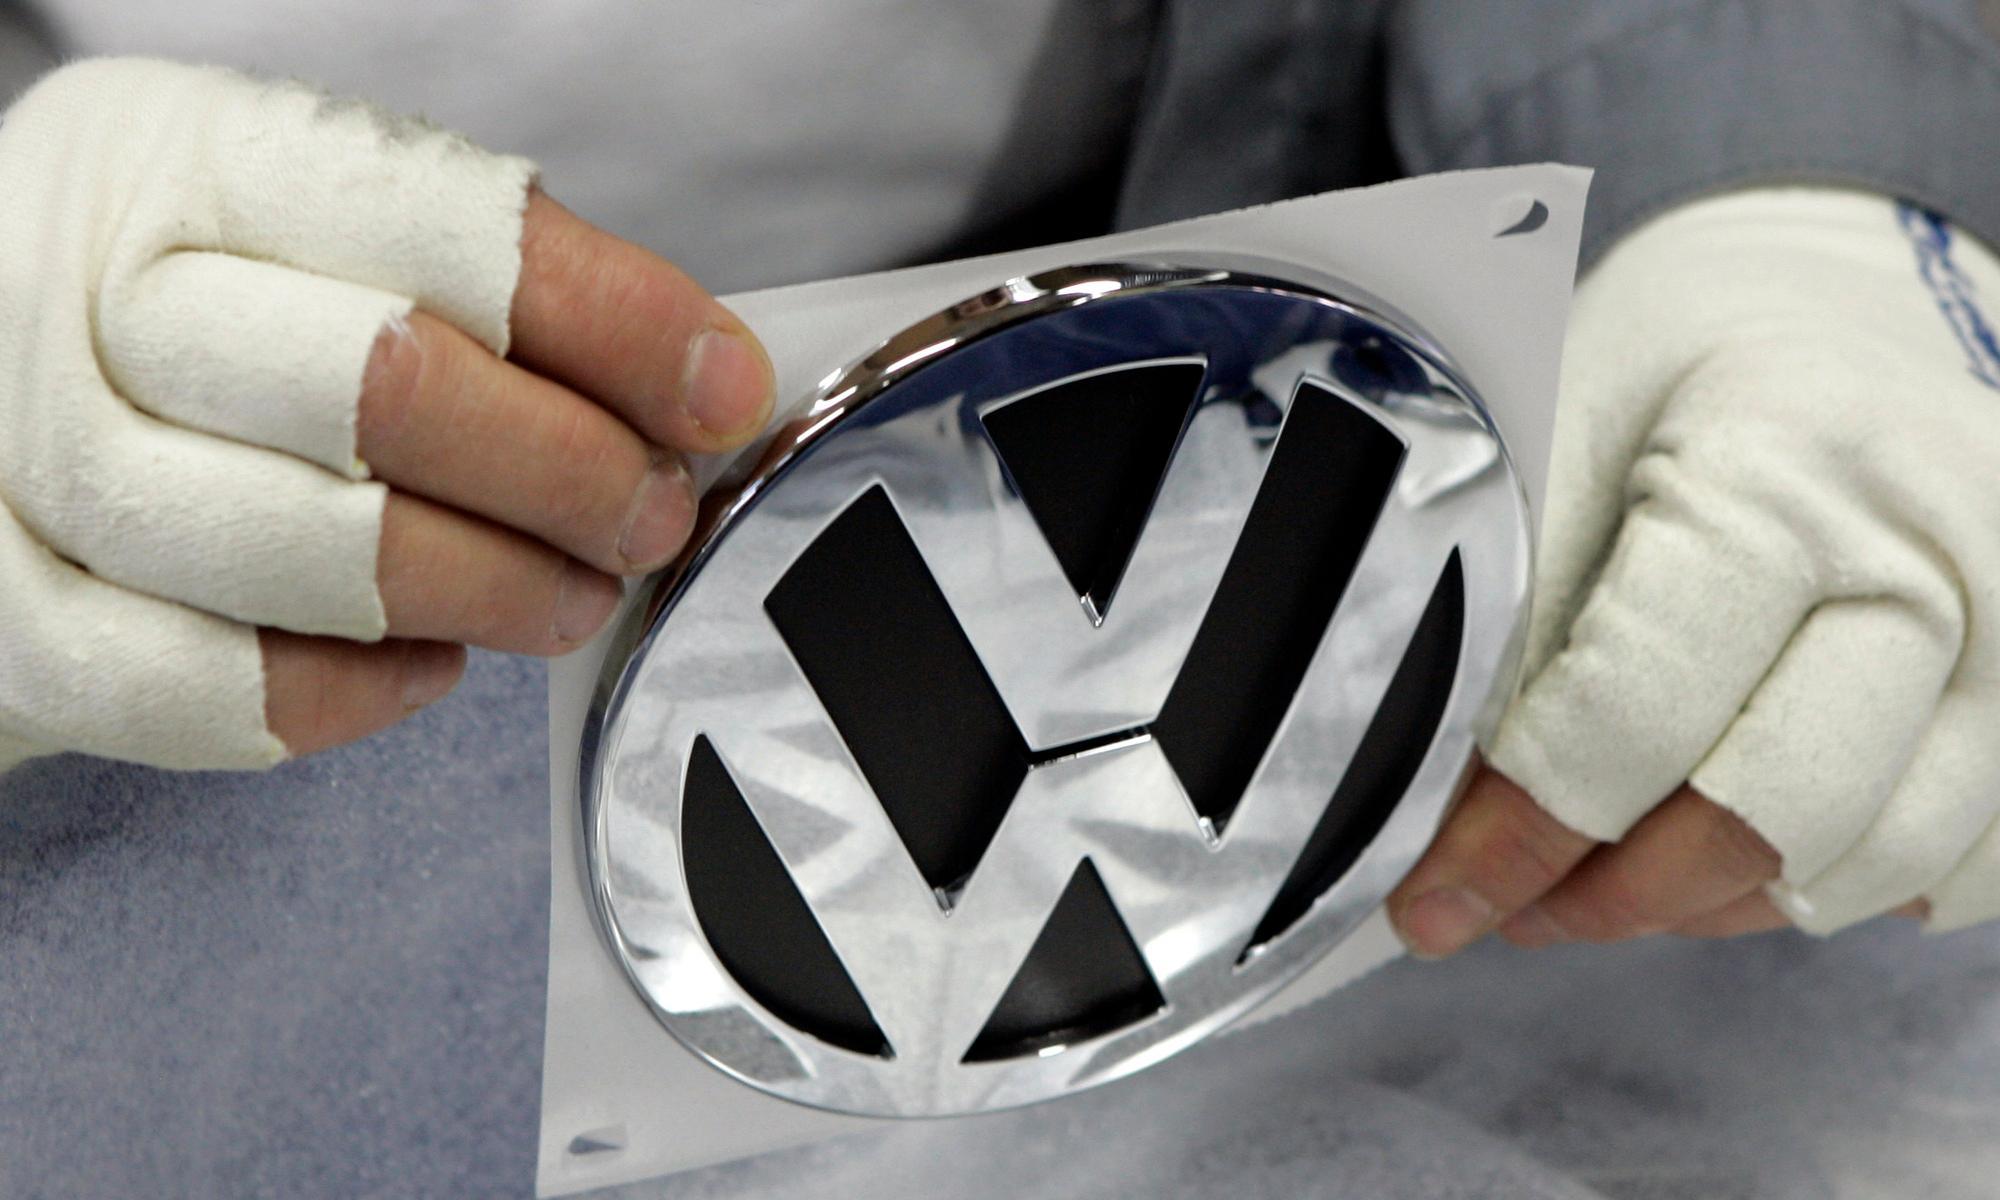 Robot kills worker at Volkswagen plant in Germany